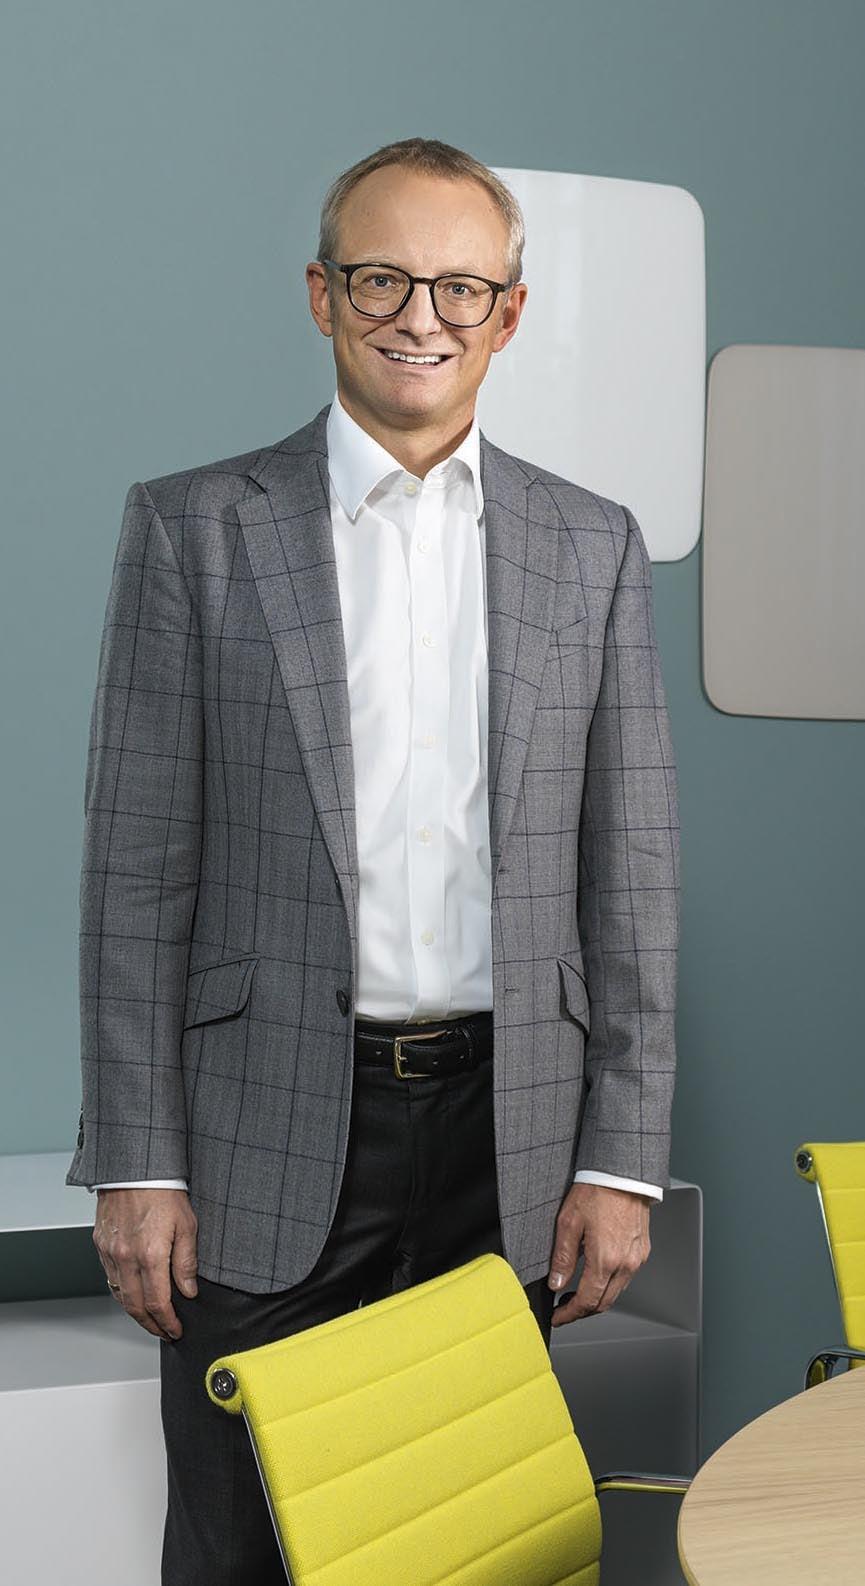 Dr. Axel Wepler, Rechtsanwalt Steuerberater Fachberater für Internationales Steuerrecht